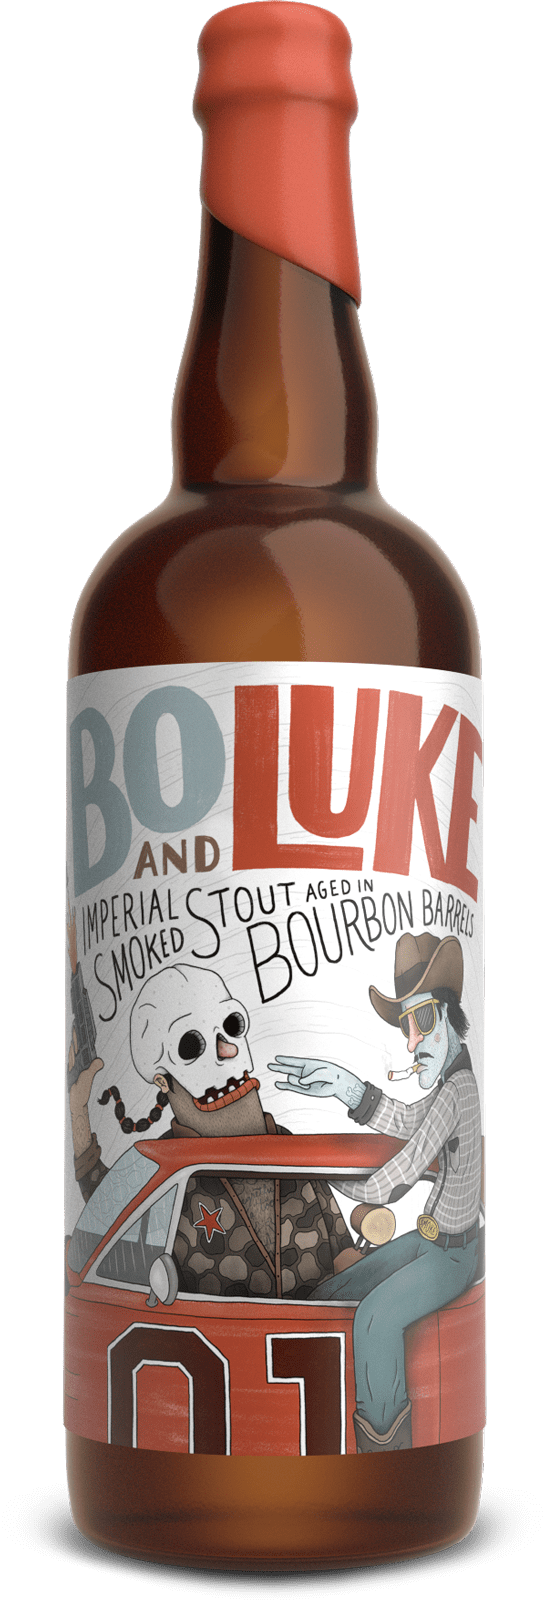 bo-luke-mock